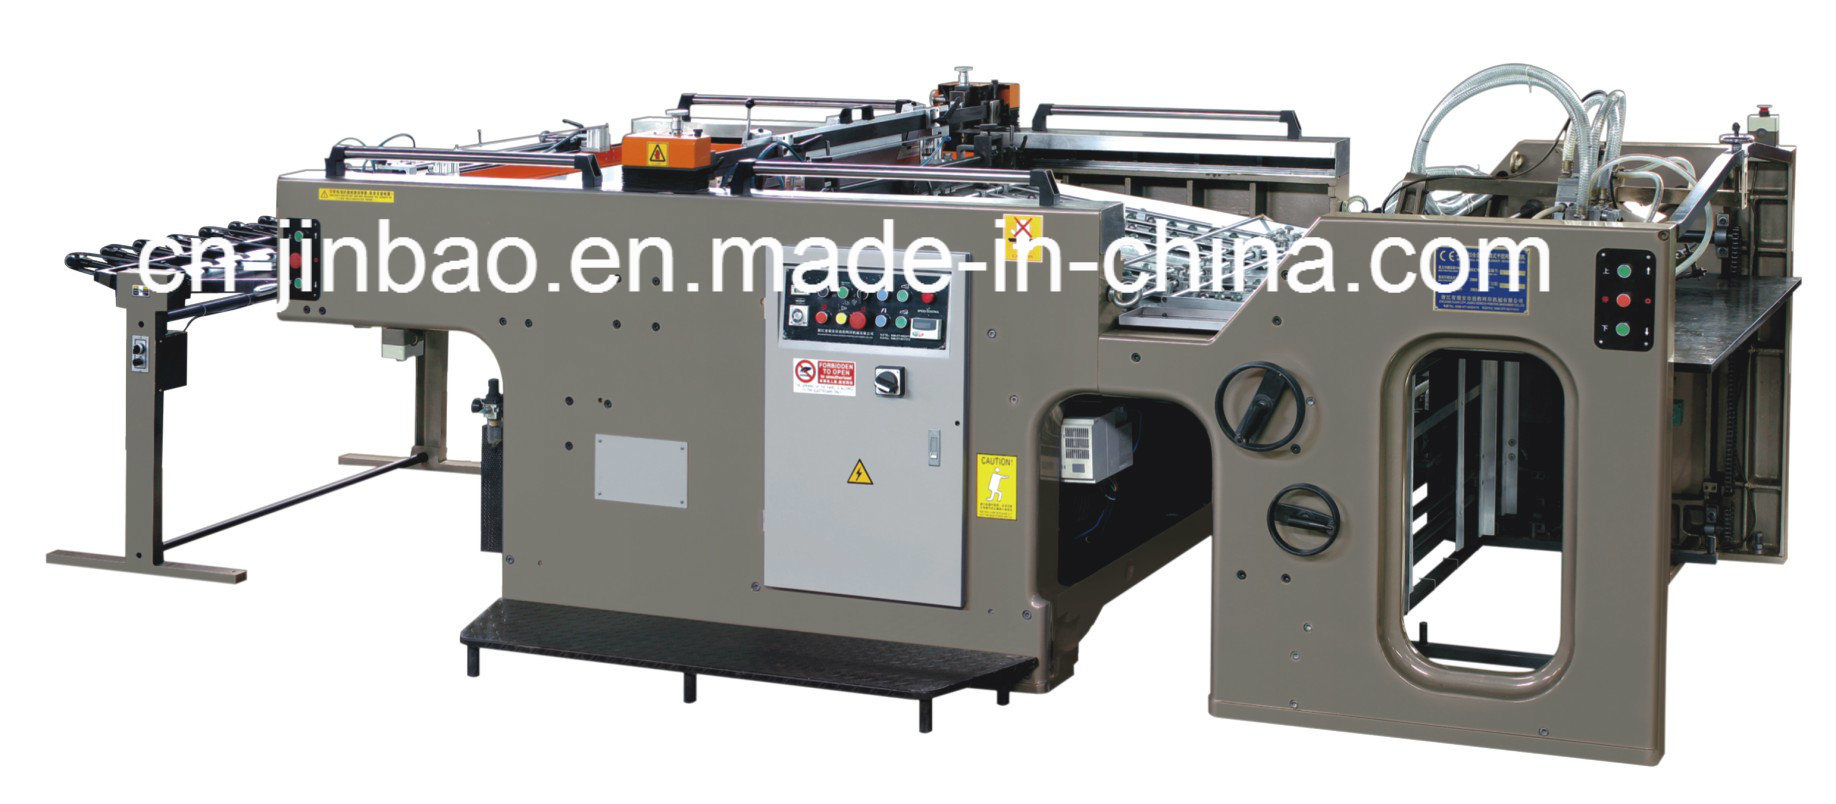 Automatic Cylinder Screen Printing Machine 720X520mm (JB-720)